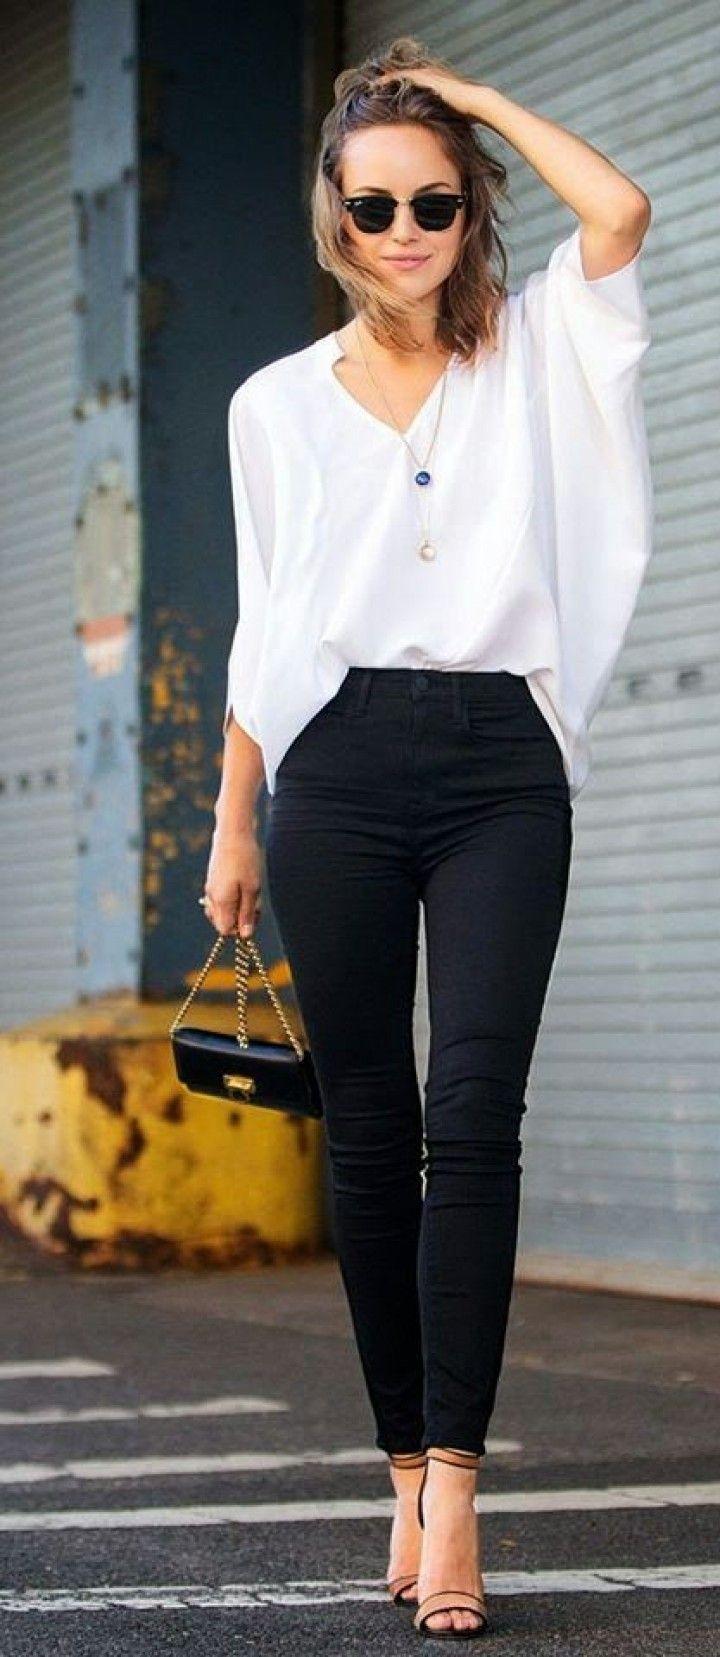 20 attractive office attire to wear this summer | office attire